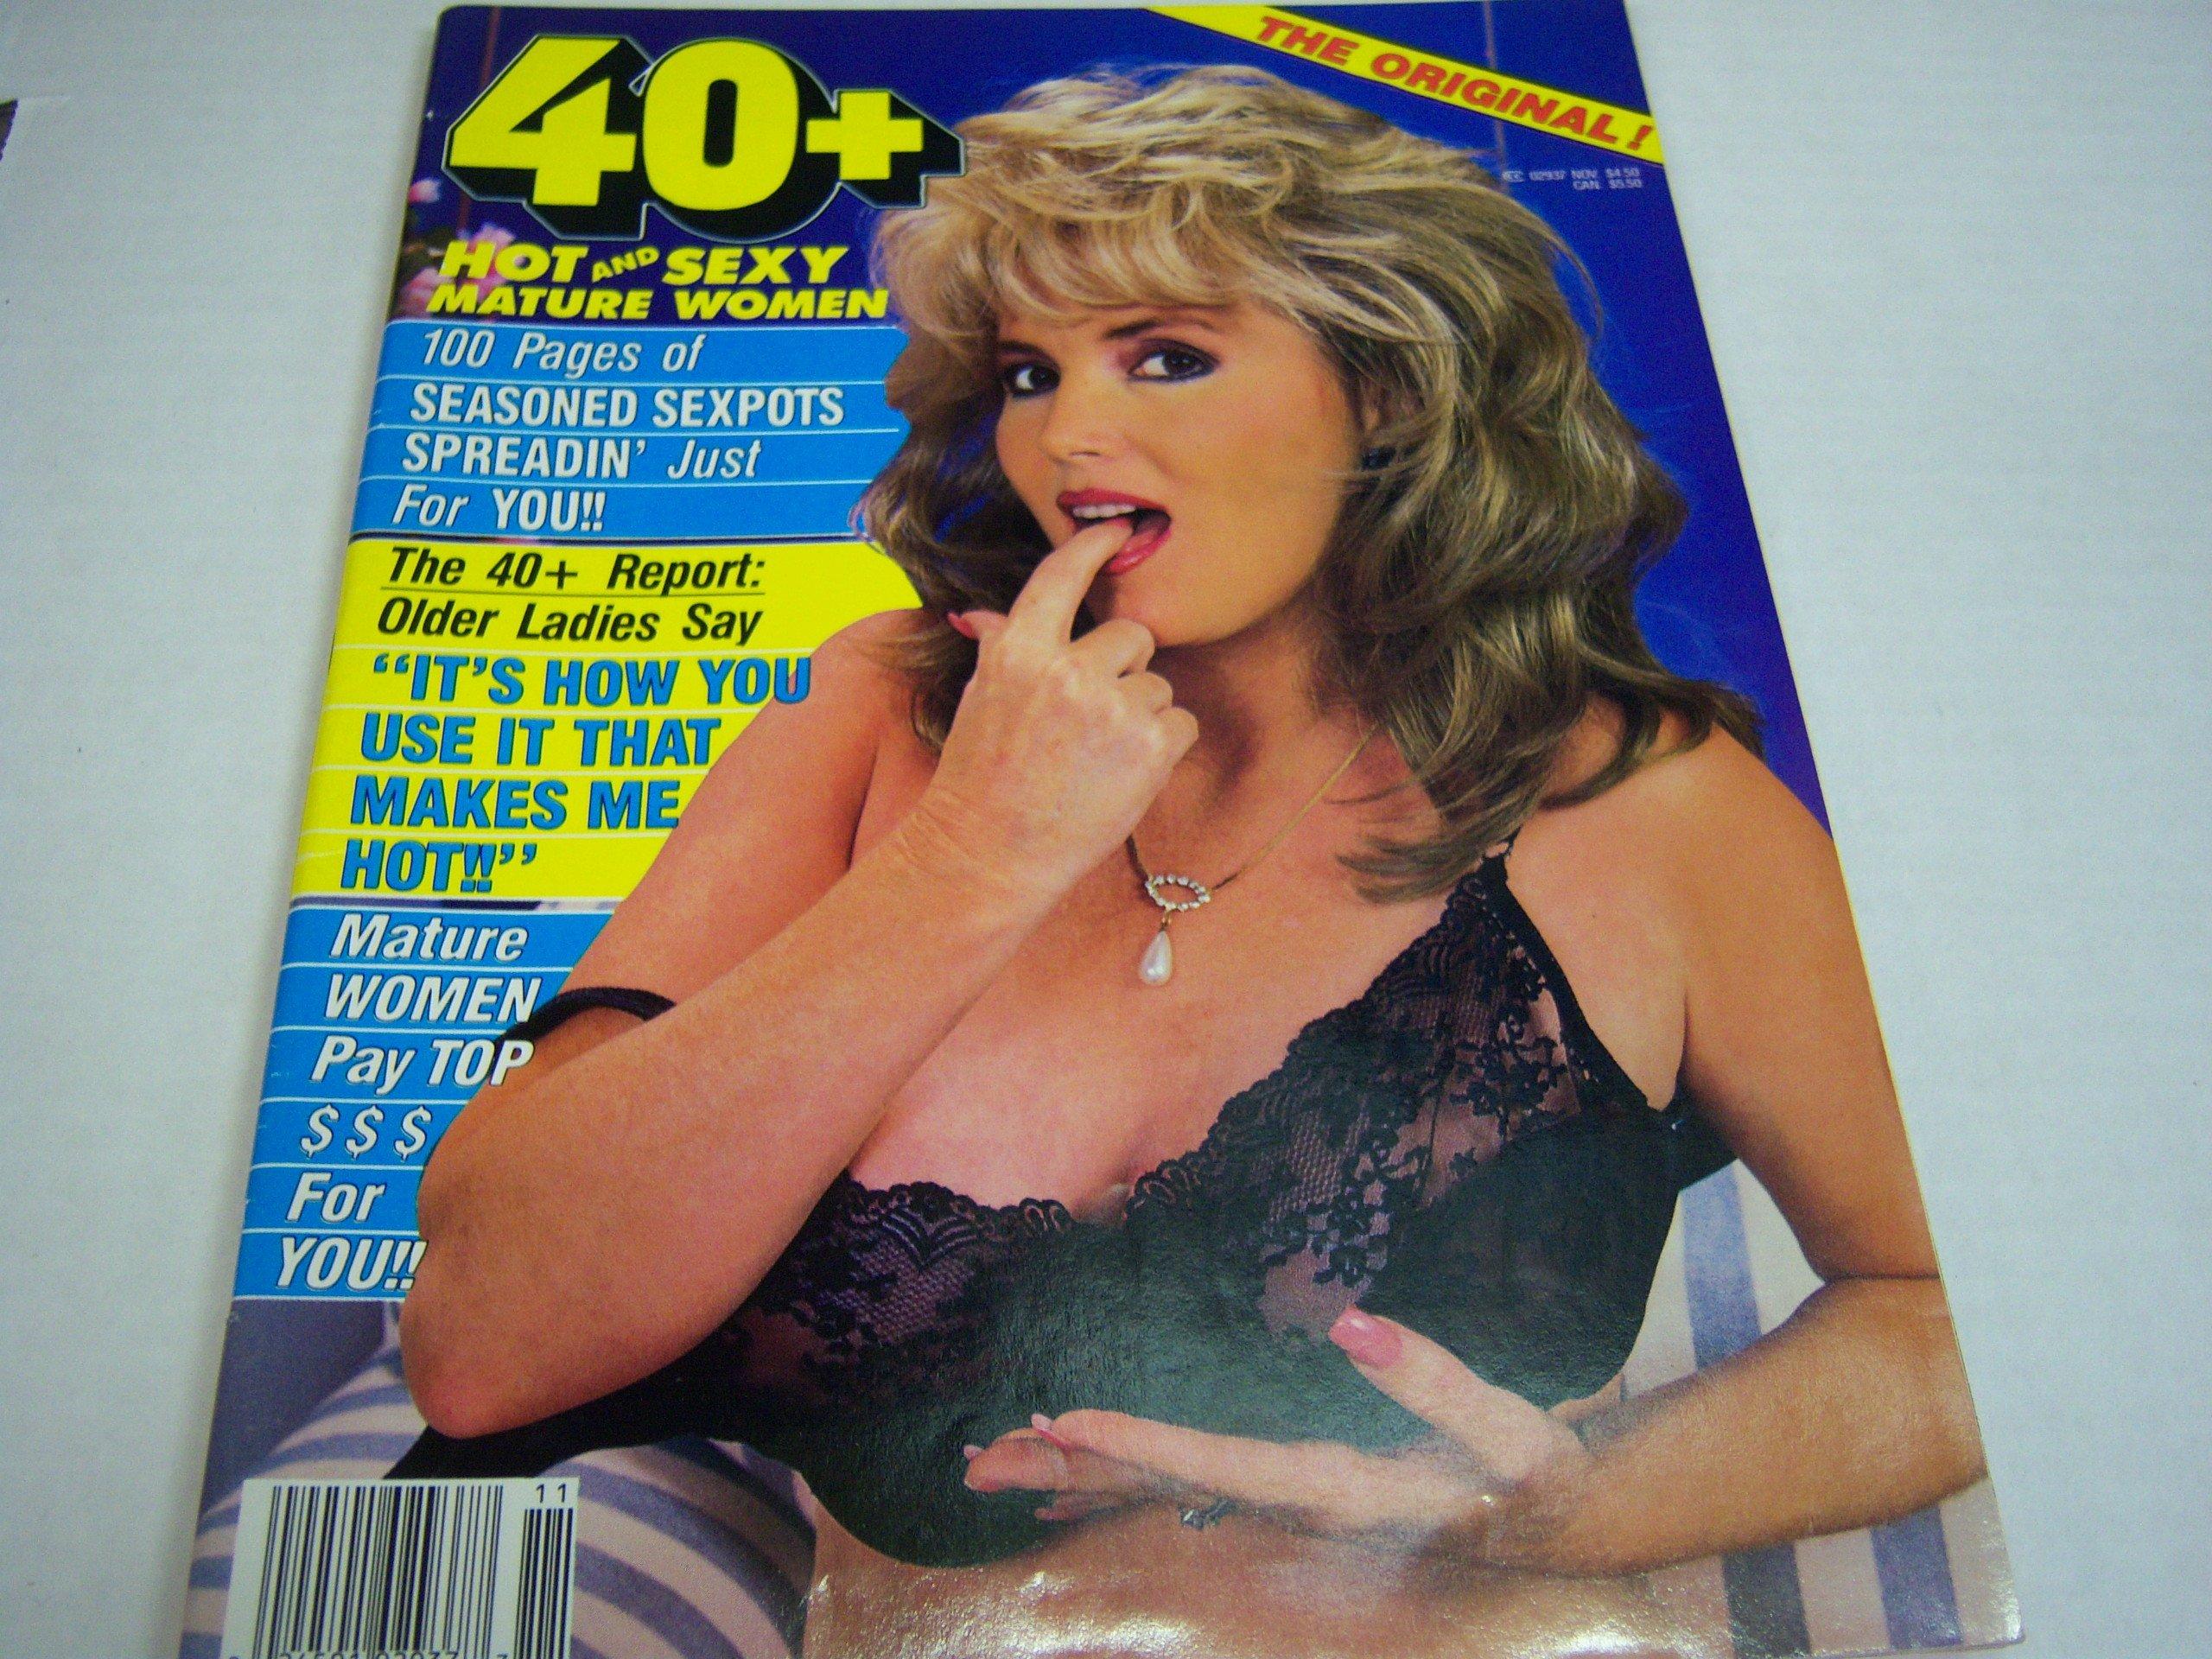 Brandi belle fuck anal